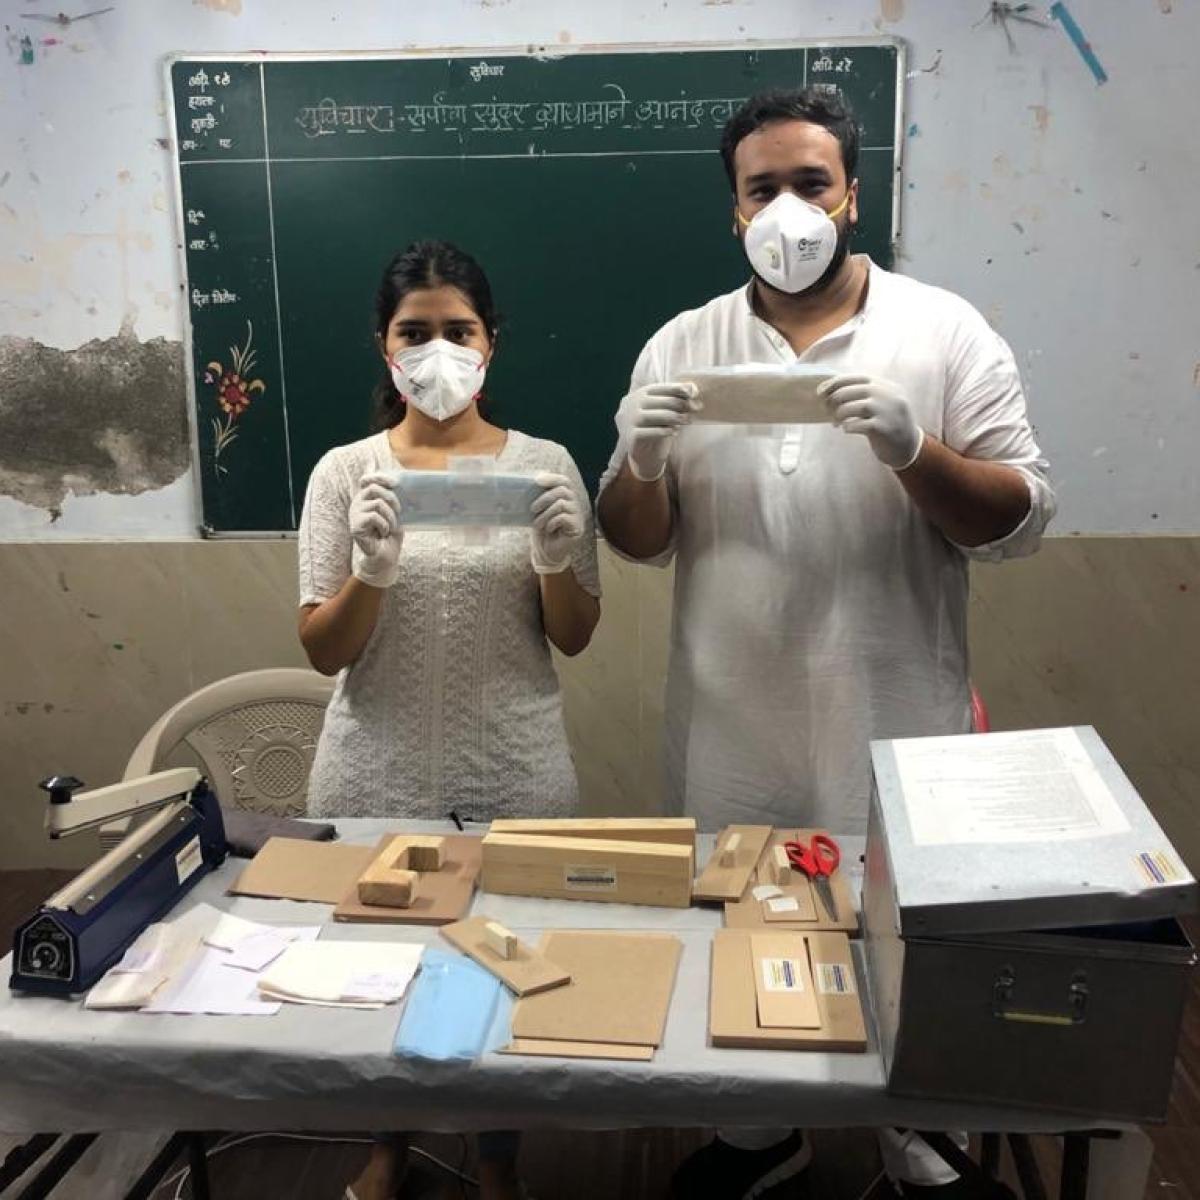 Mumbai: Bandra MLA initiates 'make and distribute' drive of sanitary napkins